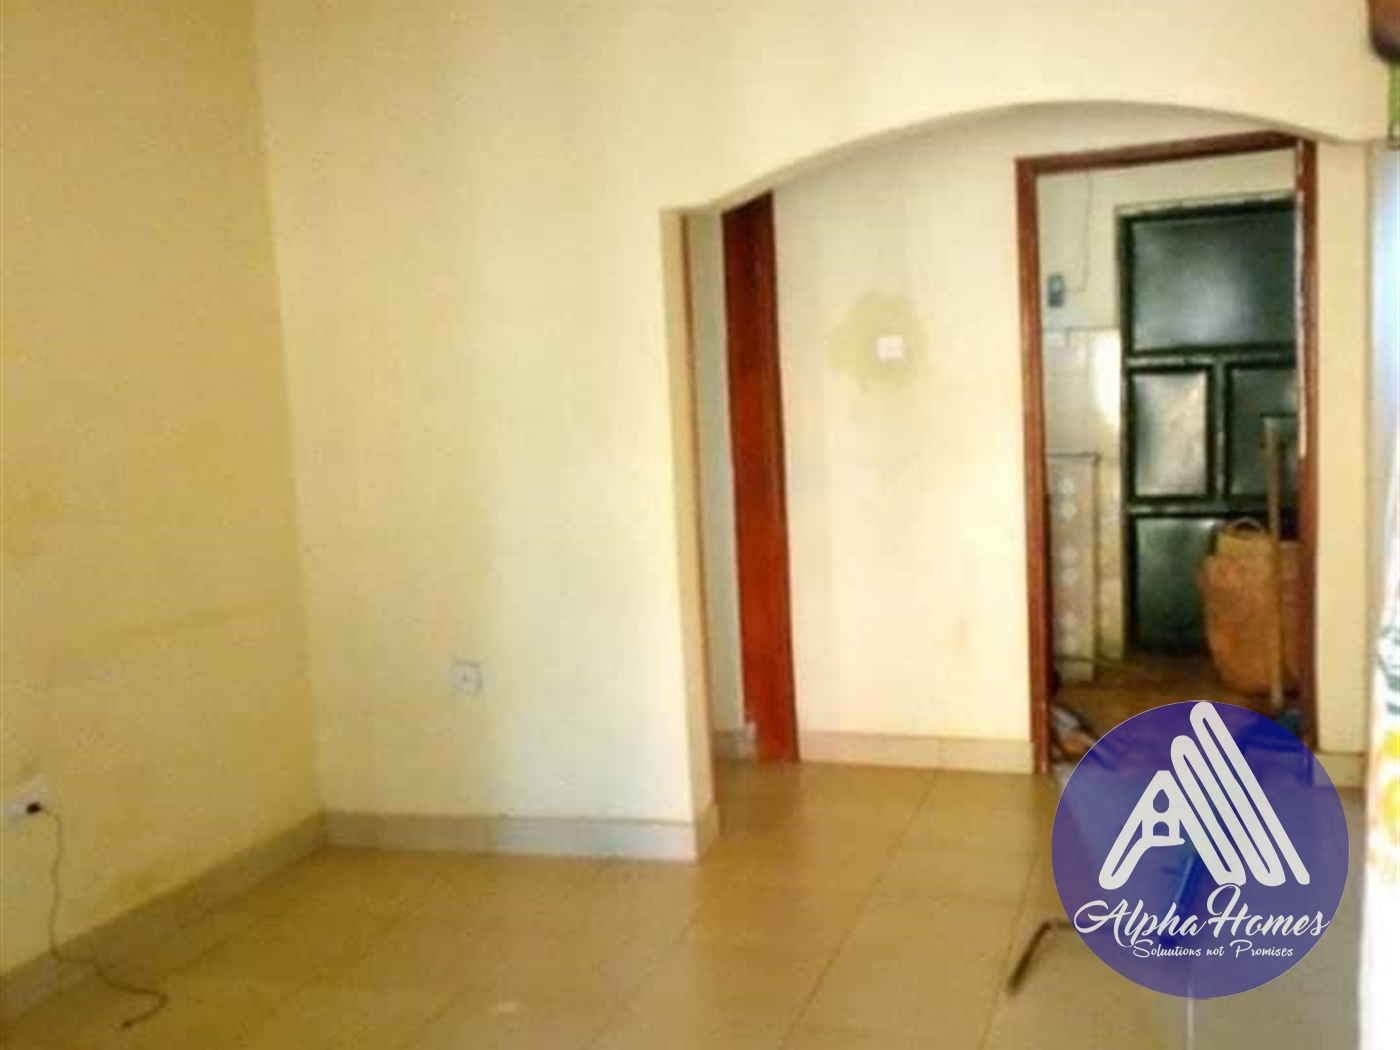 Apartment for rent in Gayaza Kampala